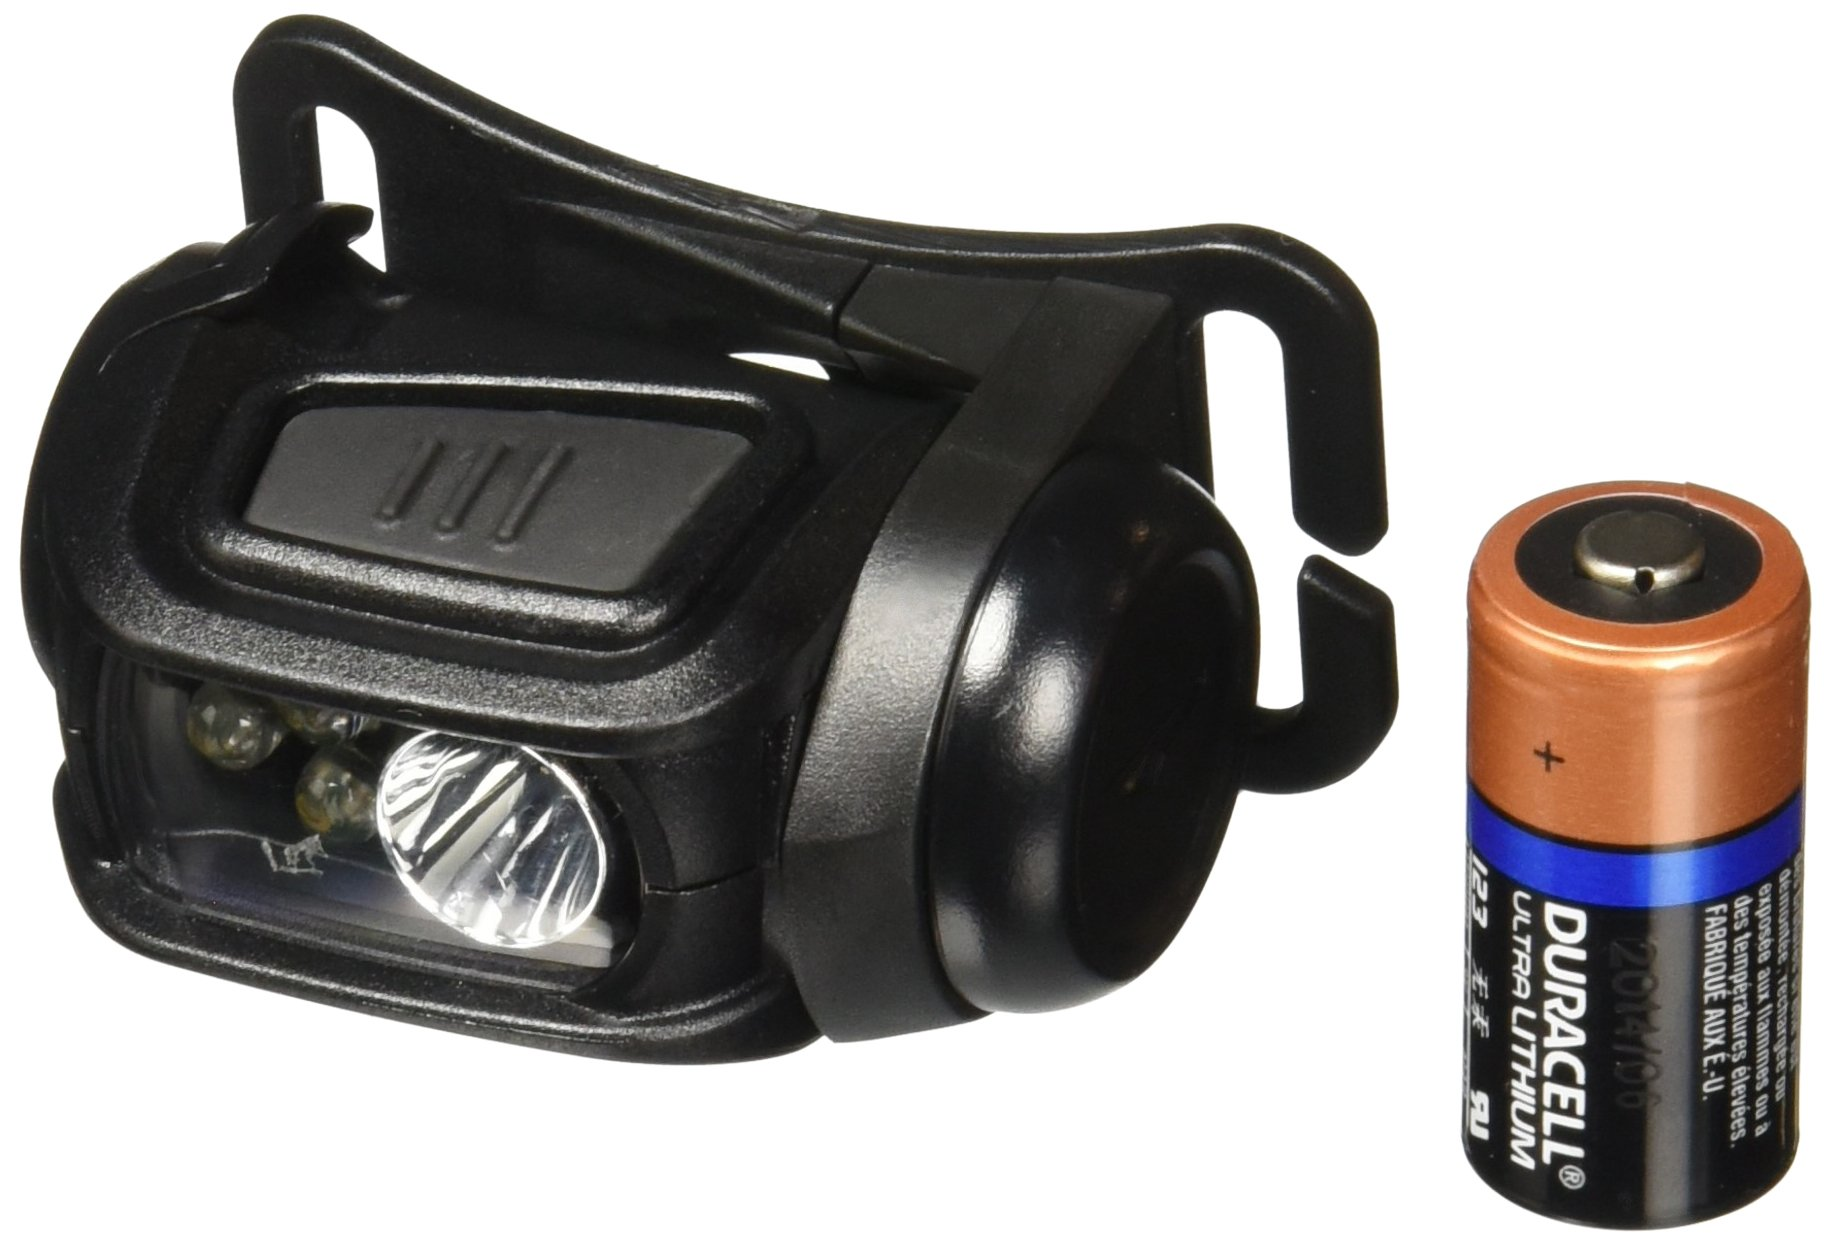 Princeton Tec Remix Pro Headlamp with Red LEDs, Black